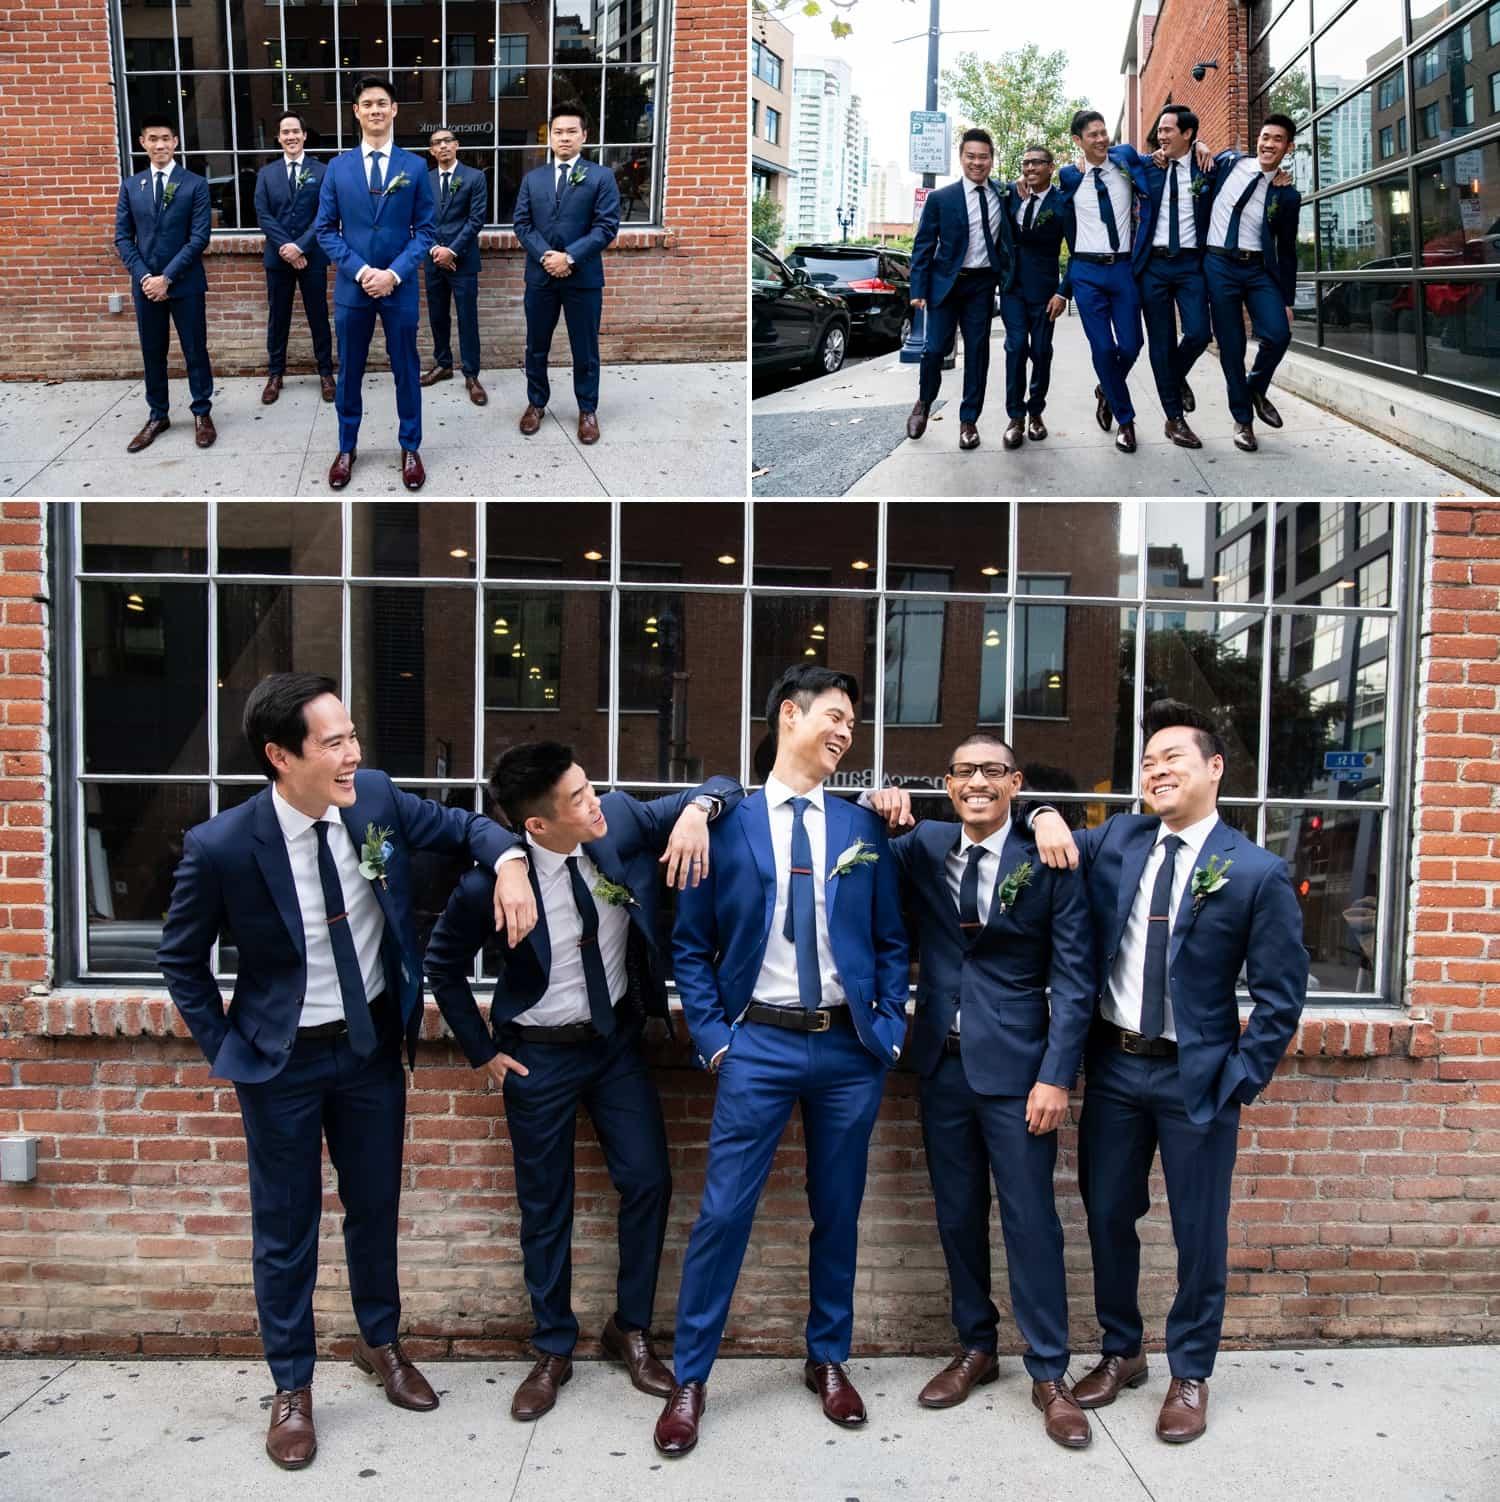 Groom with his groomsmen in downtown San Diego.